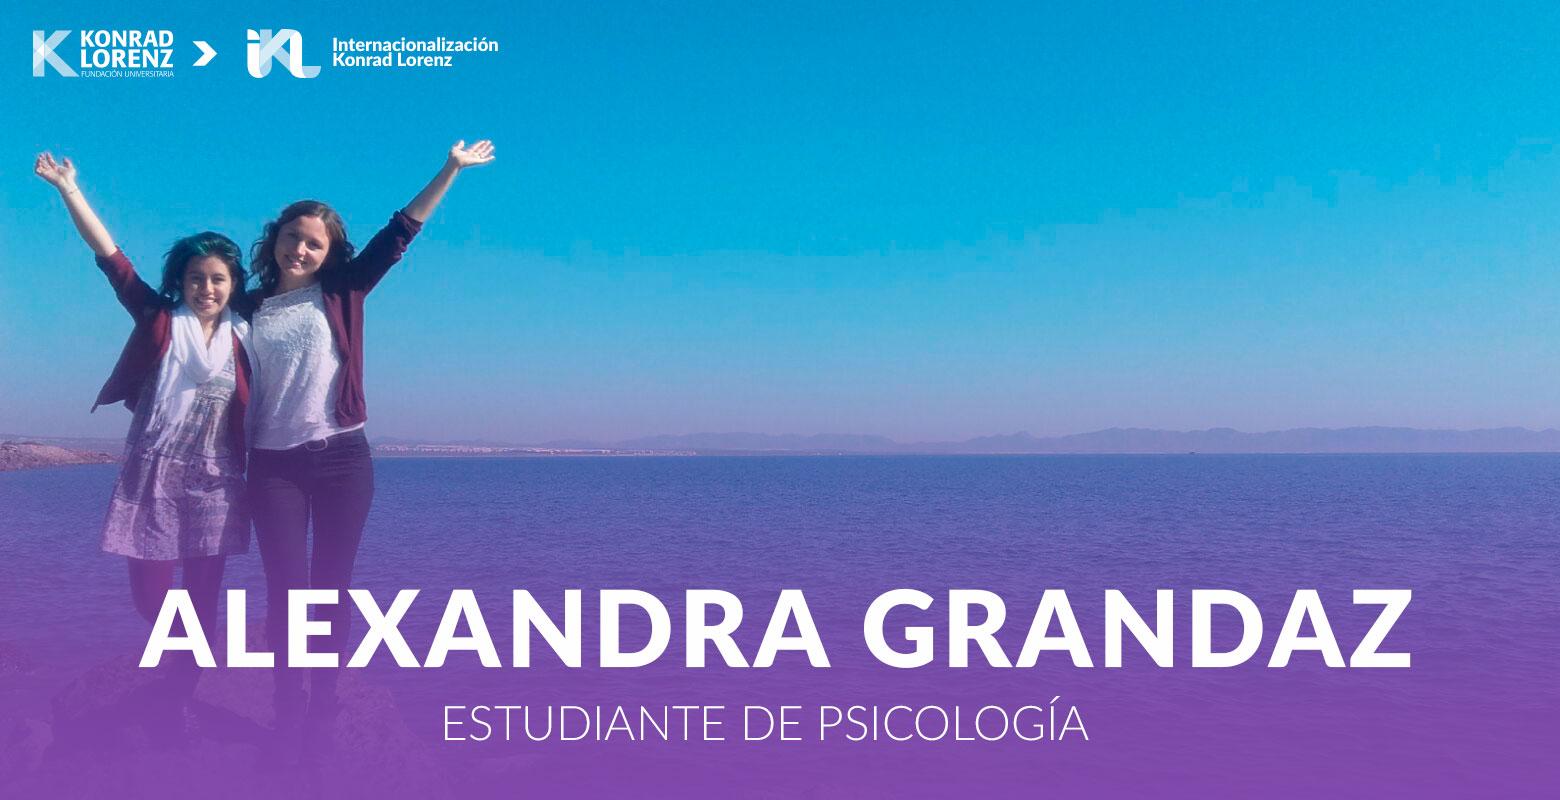 Alexandra Grandaz